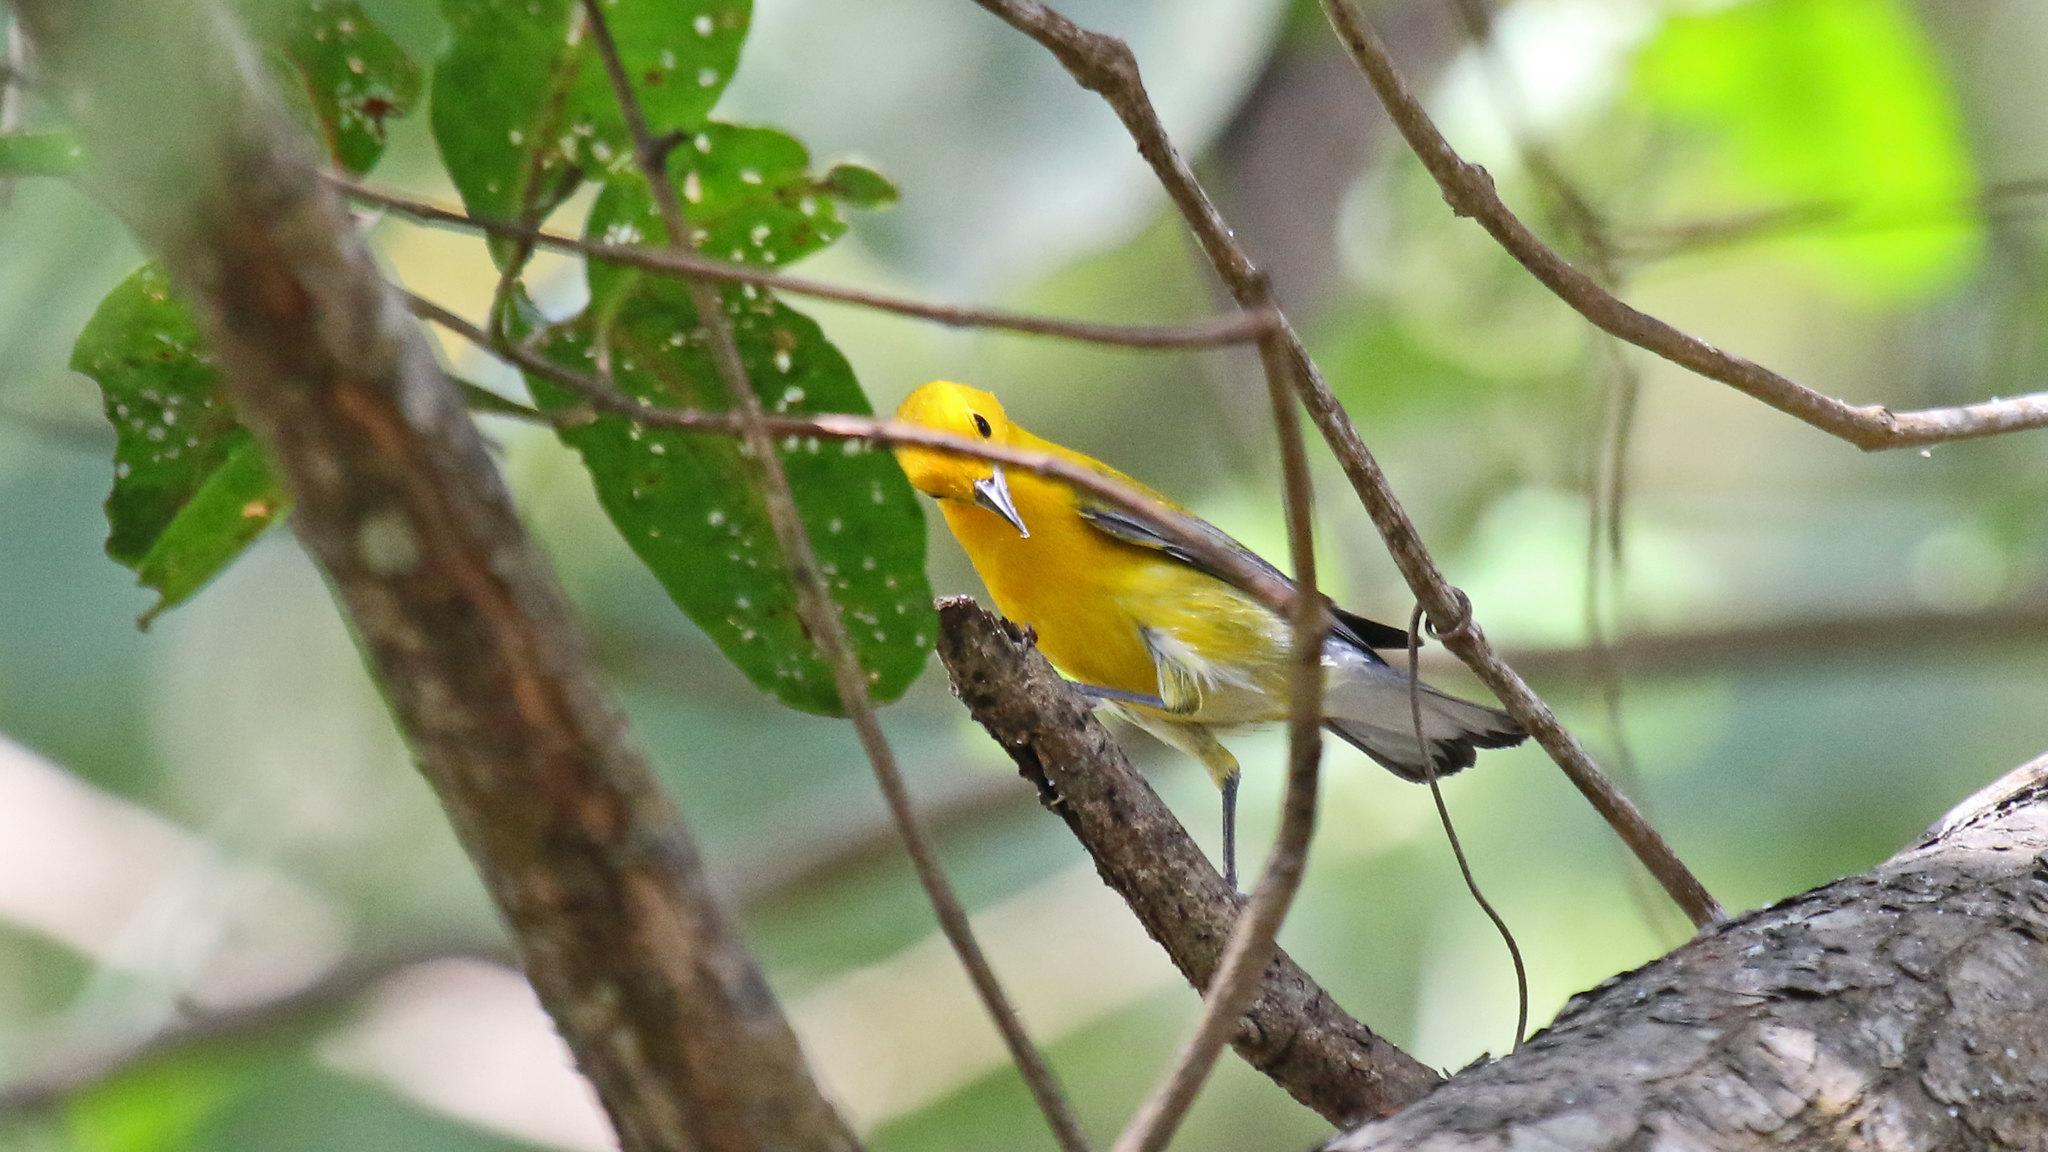 Protonotary warbler - Protonotaria citrea